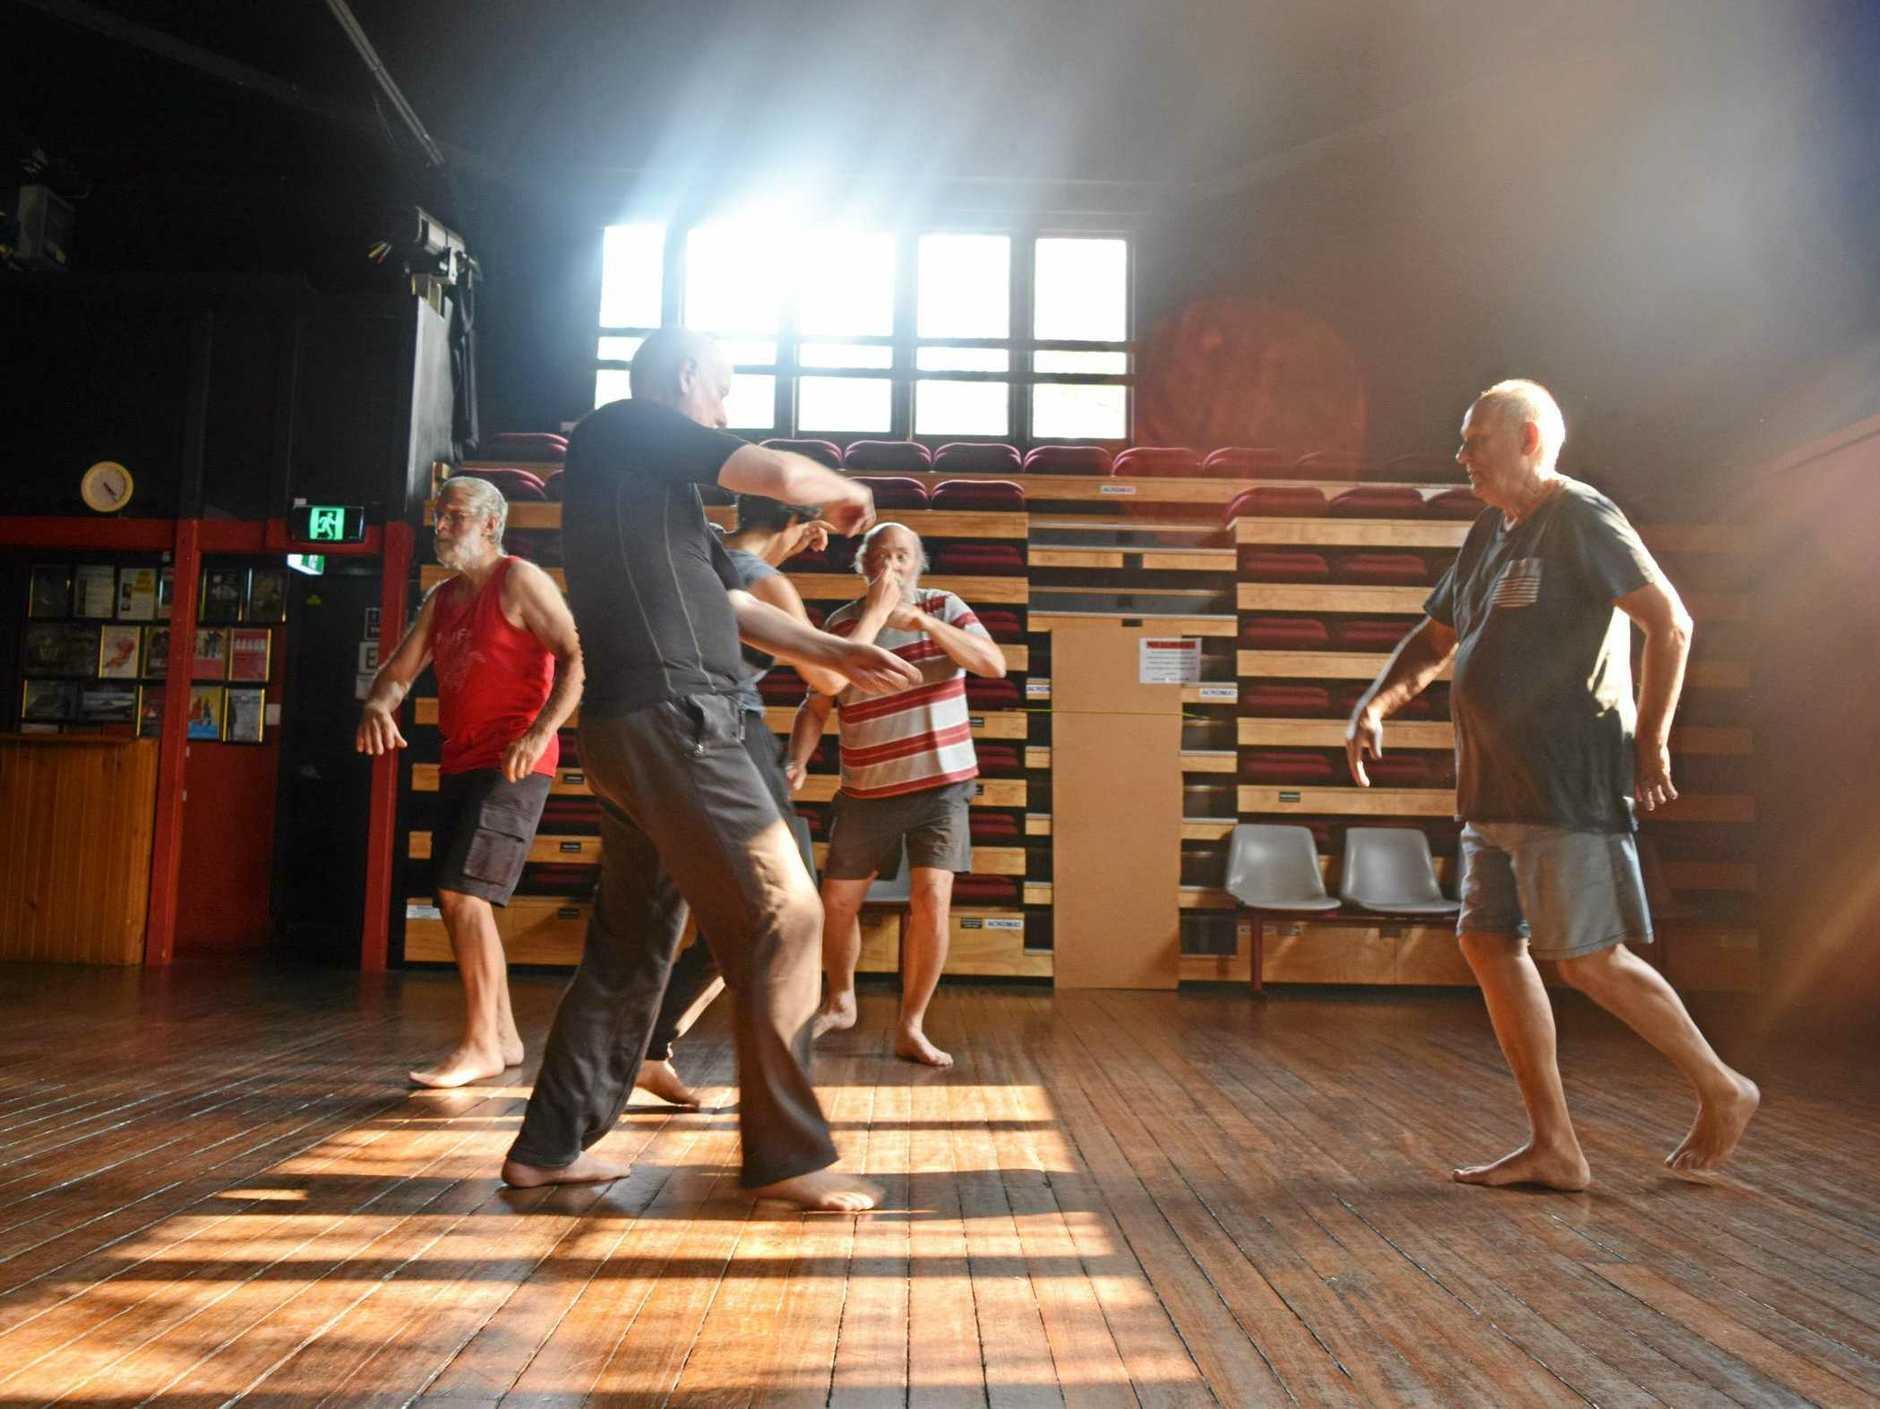 Flash Dance: Join four other team members Michael Borenstein, Alex Benham, Dale Emerson, Shel Kronich, John Allen, Ken Golding, Mike Russo, Barry and Kimberley McIntyre.